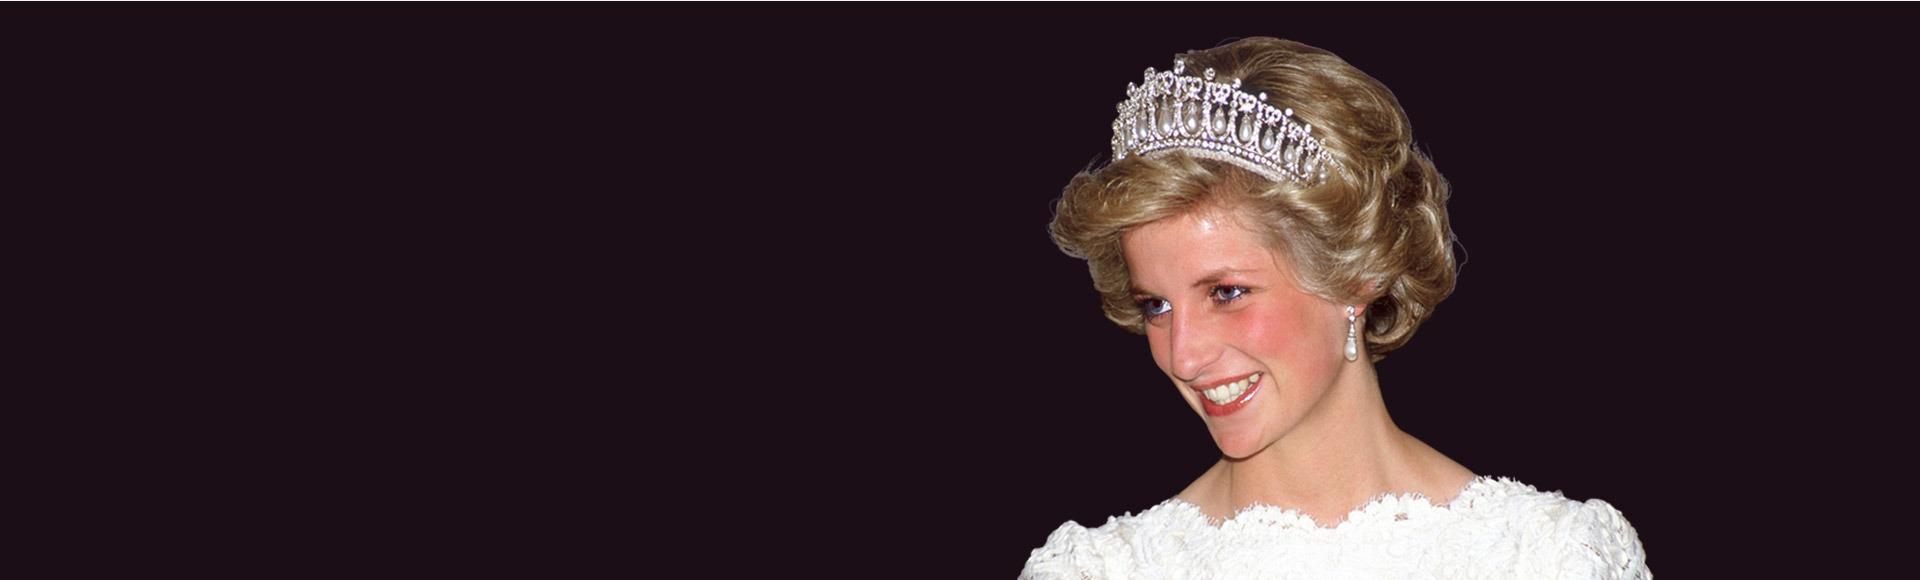 Diana: Trajedi mi, İhanet mi?